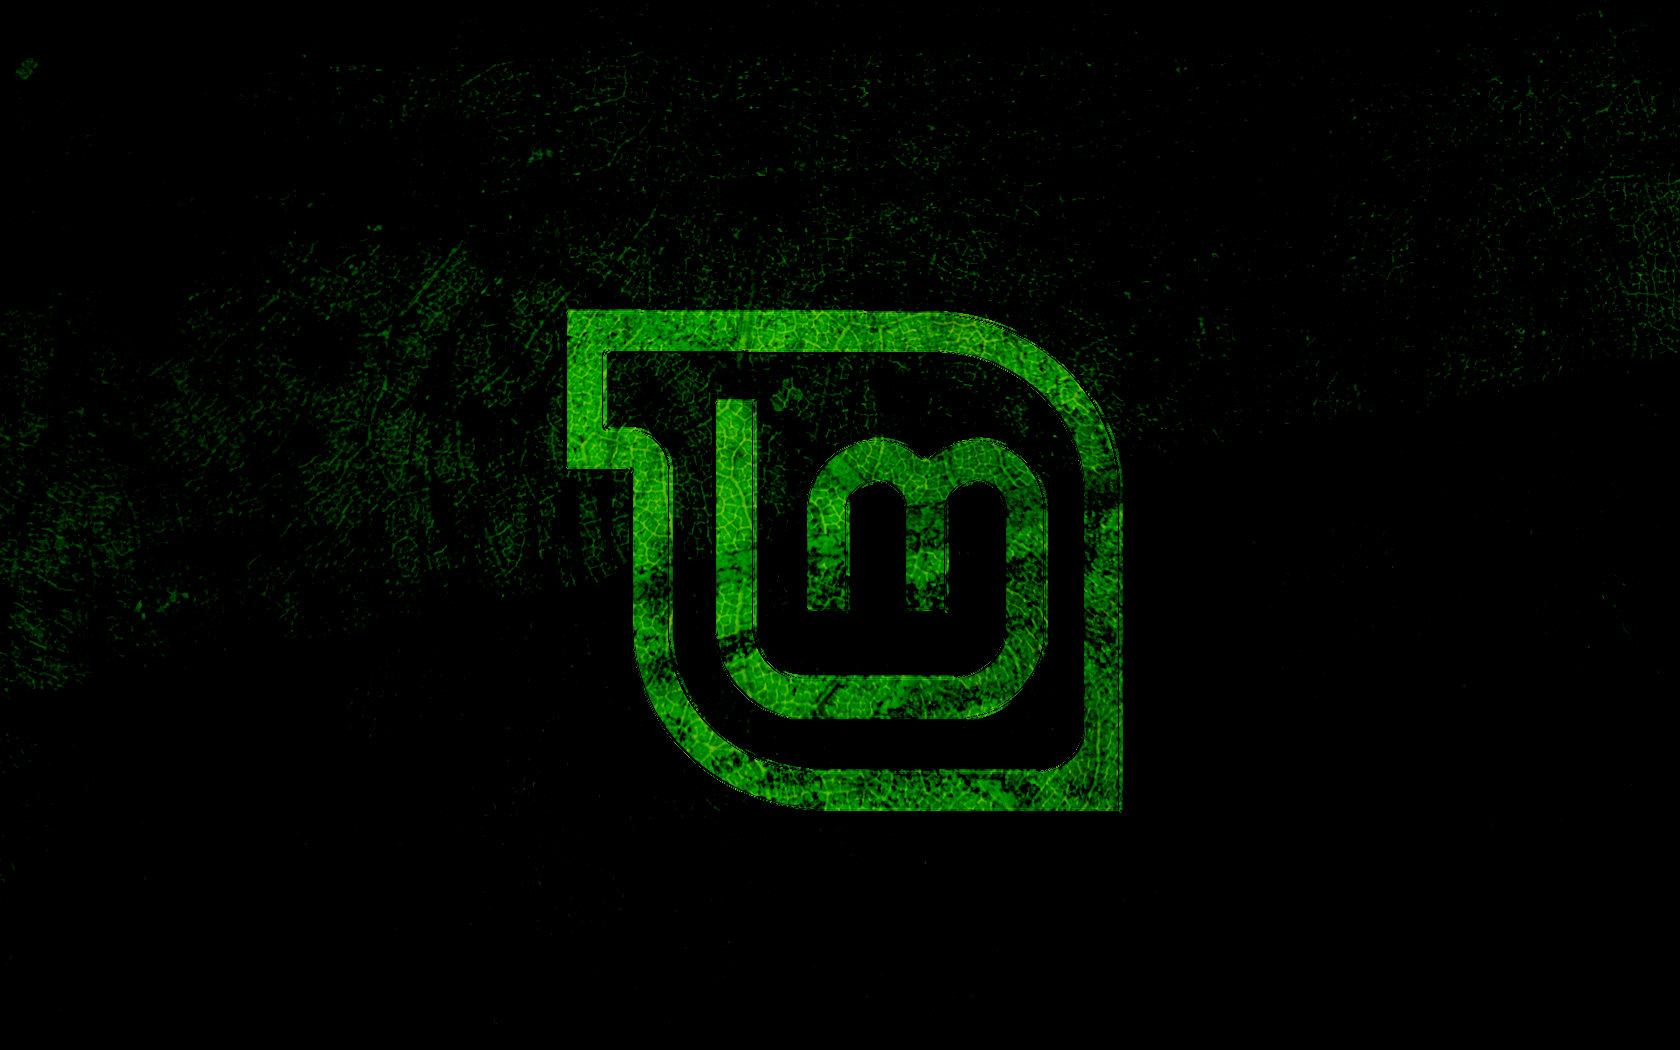 linux mint wallpaper 1680x1050 by zsoltp on deviantart